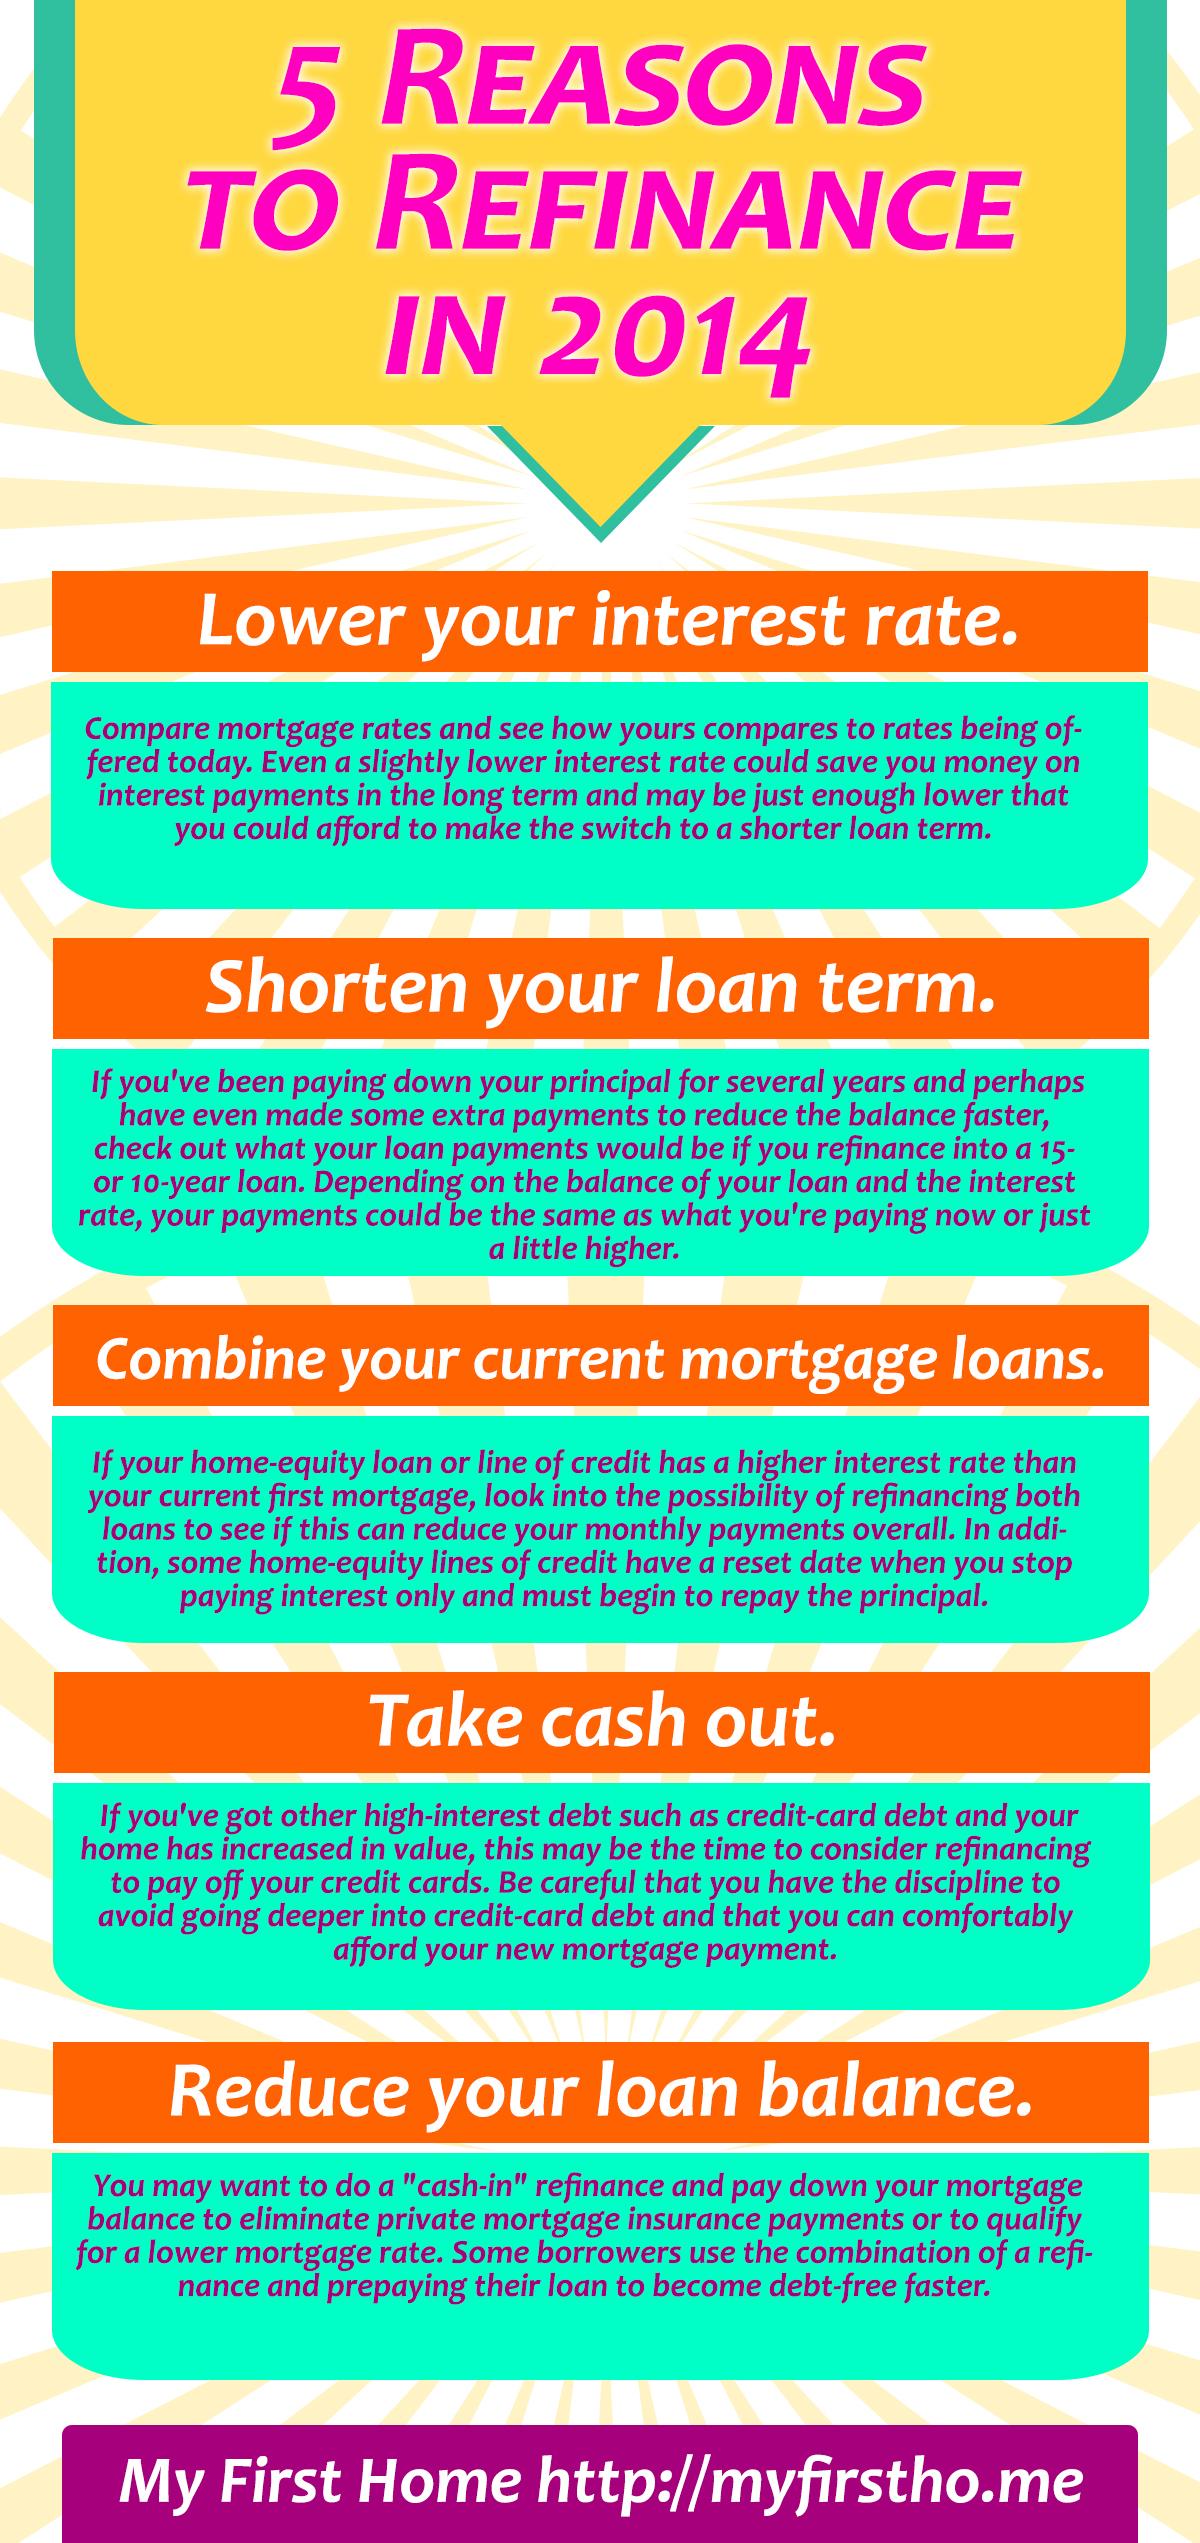 Five reasons to refinance